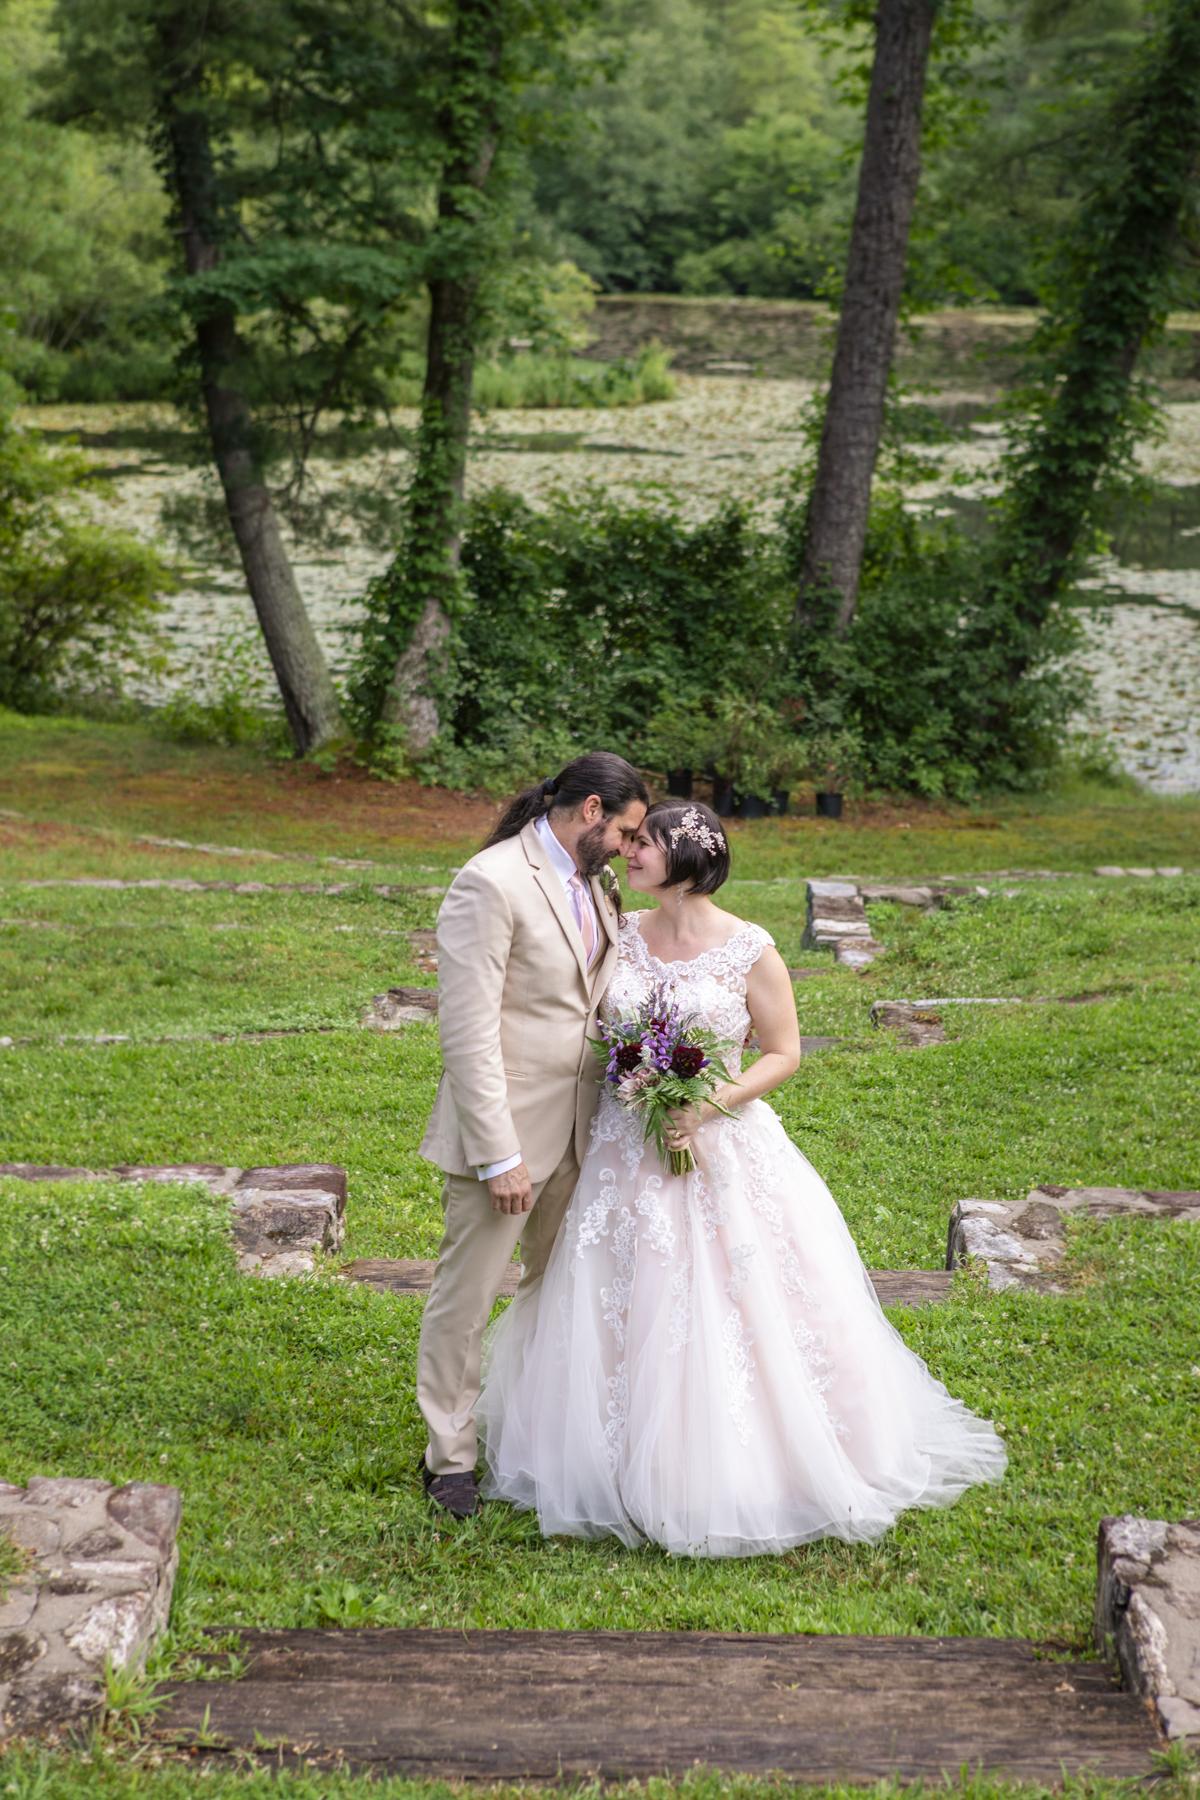 Avyanna and Phoenix Wedding 2019_photos by Studio Misha_BLOG-133.jpg